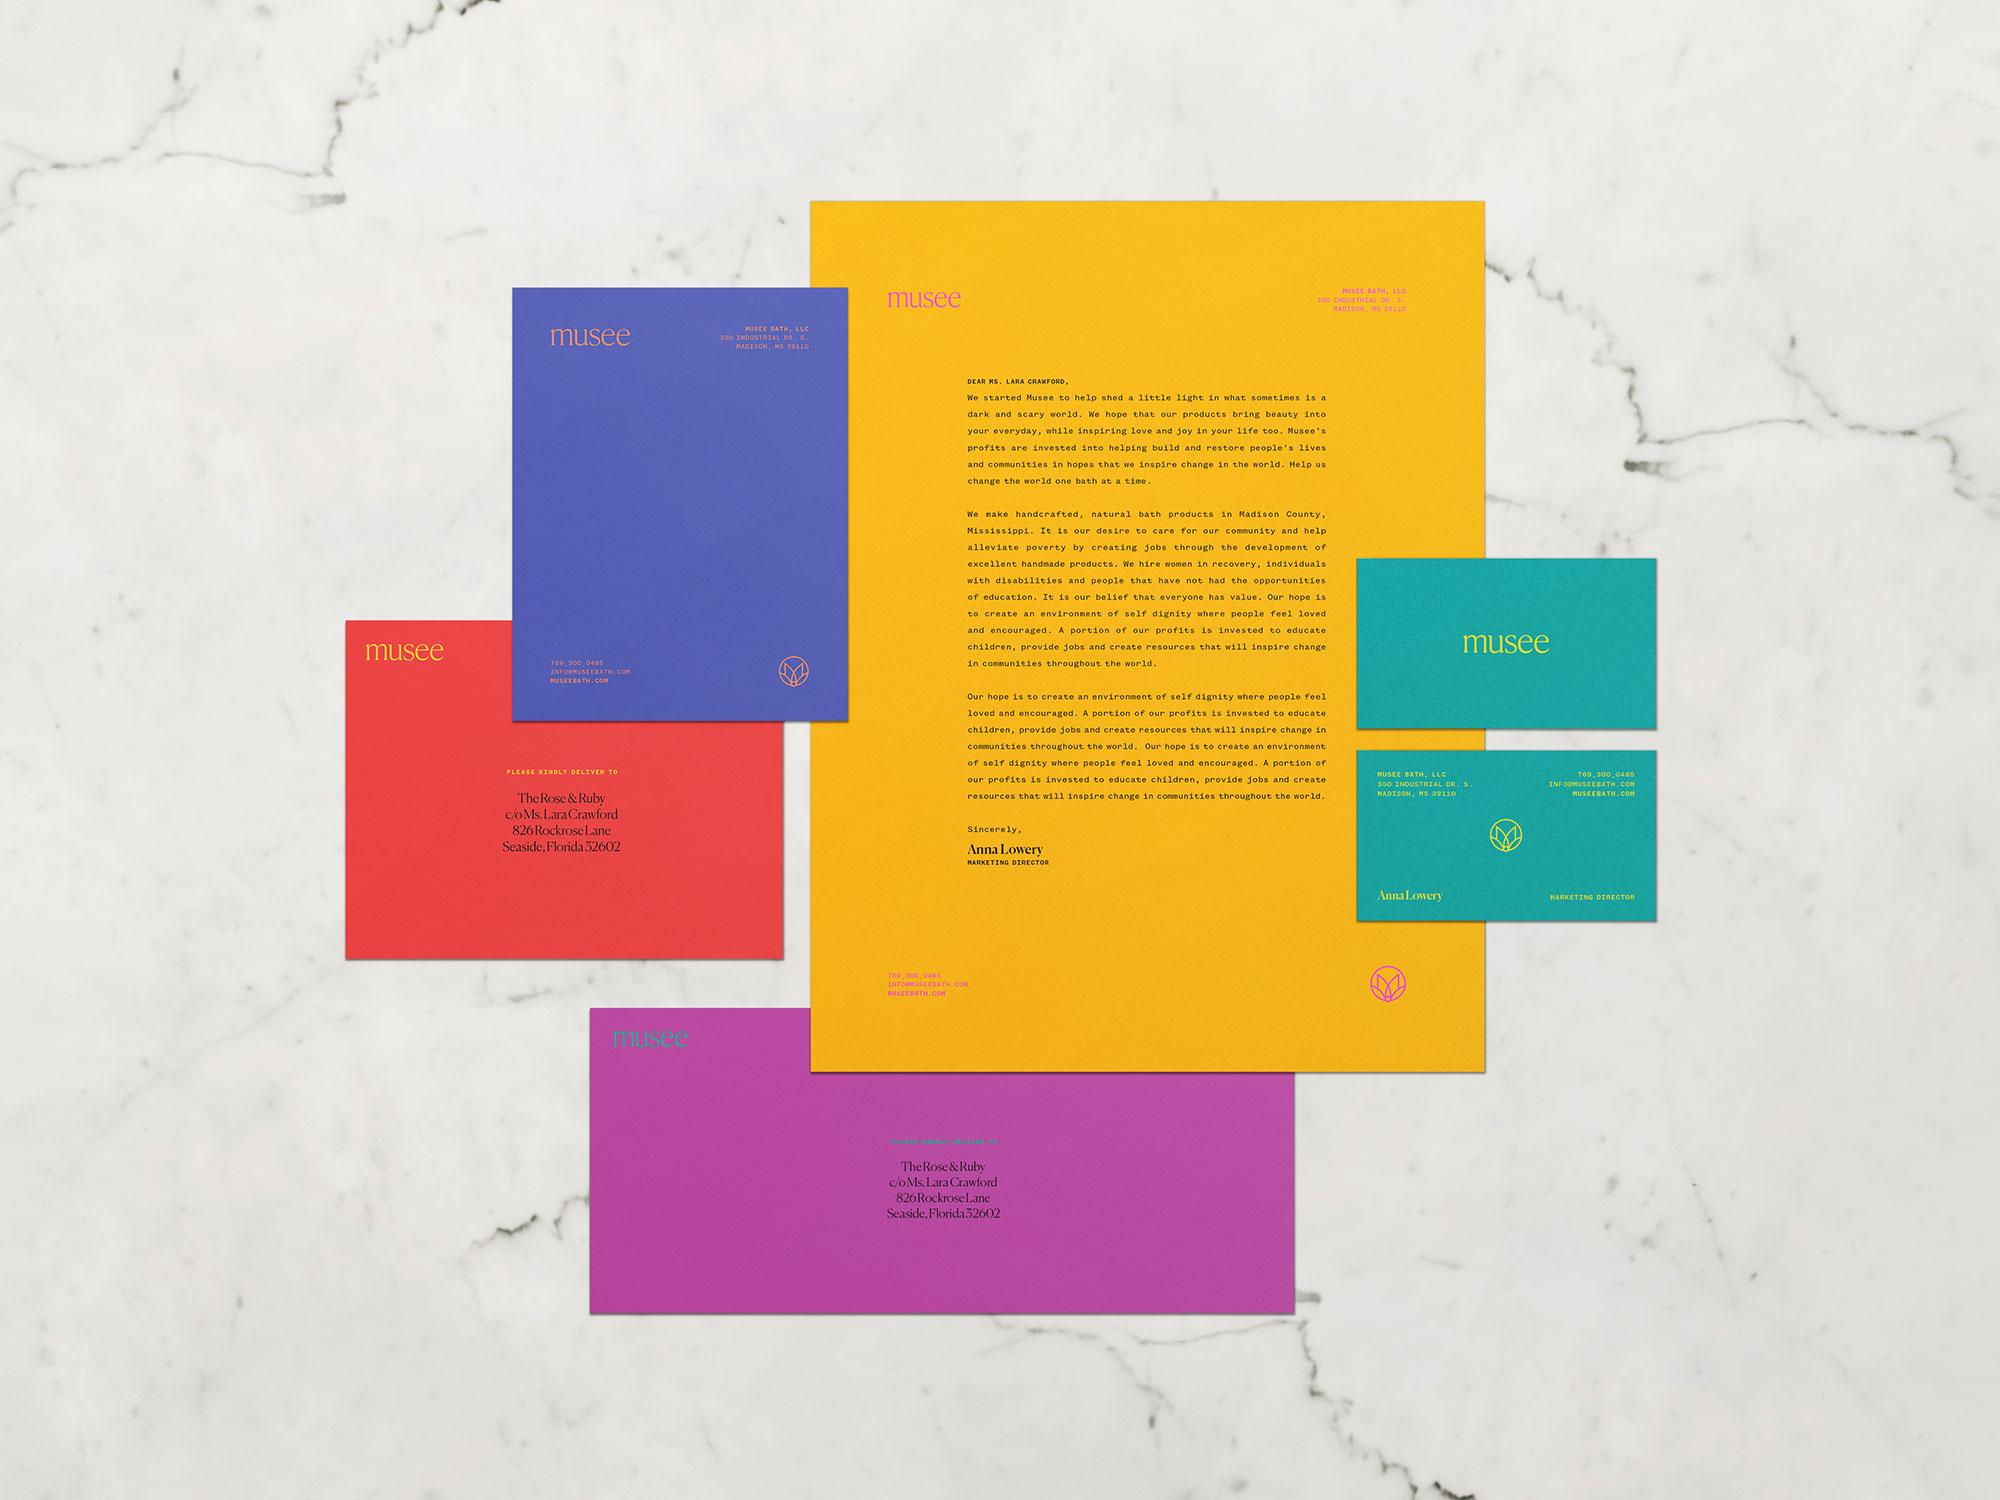 MUSEE BATH (1/3)   Studio Work Proposed Design   Creative Direction  José Reyes   Art Direction  Ashley Shugart   WORK   Branding Identity  —